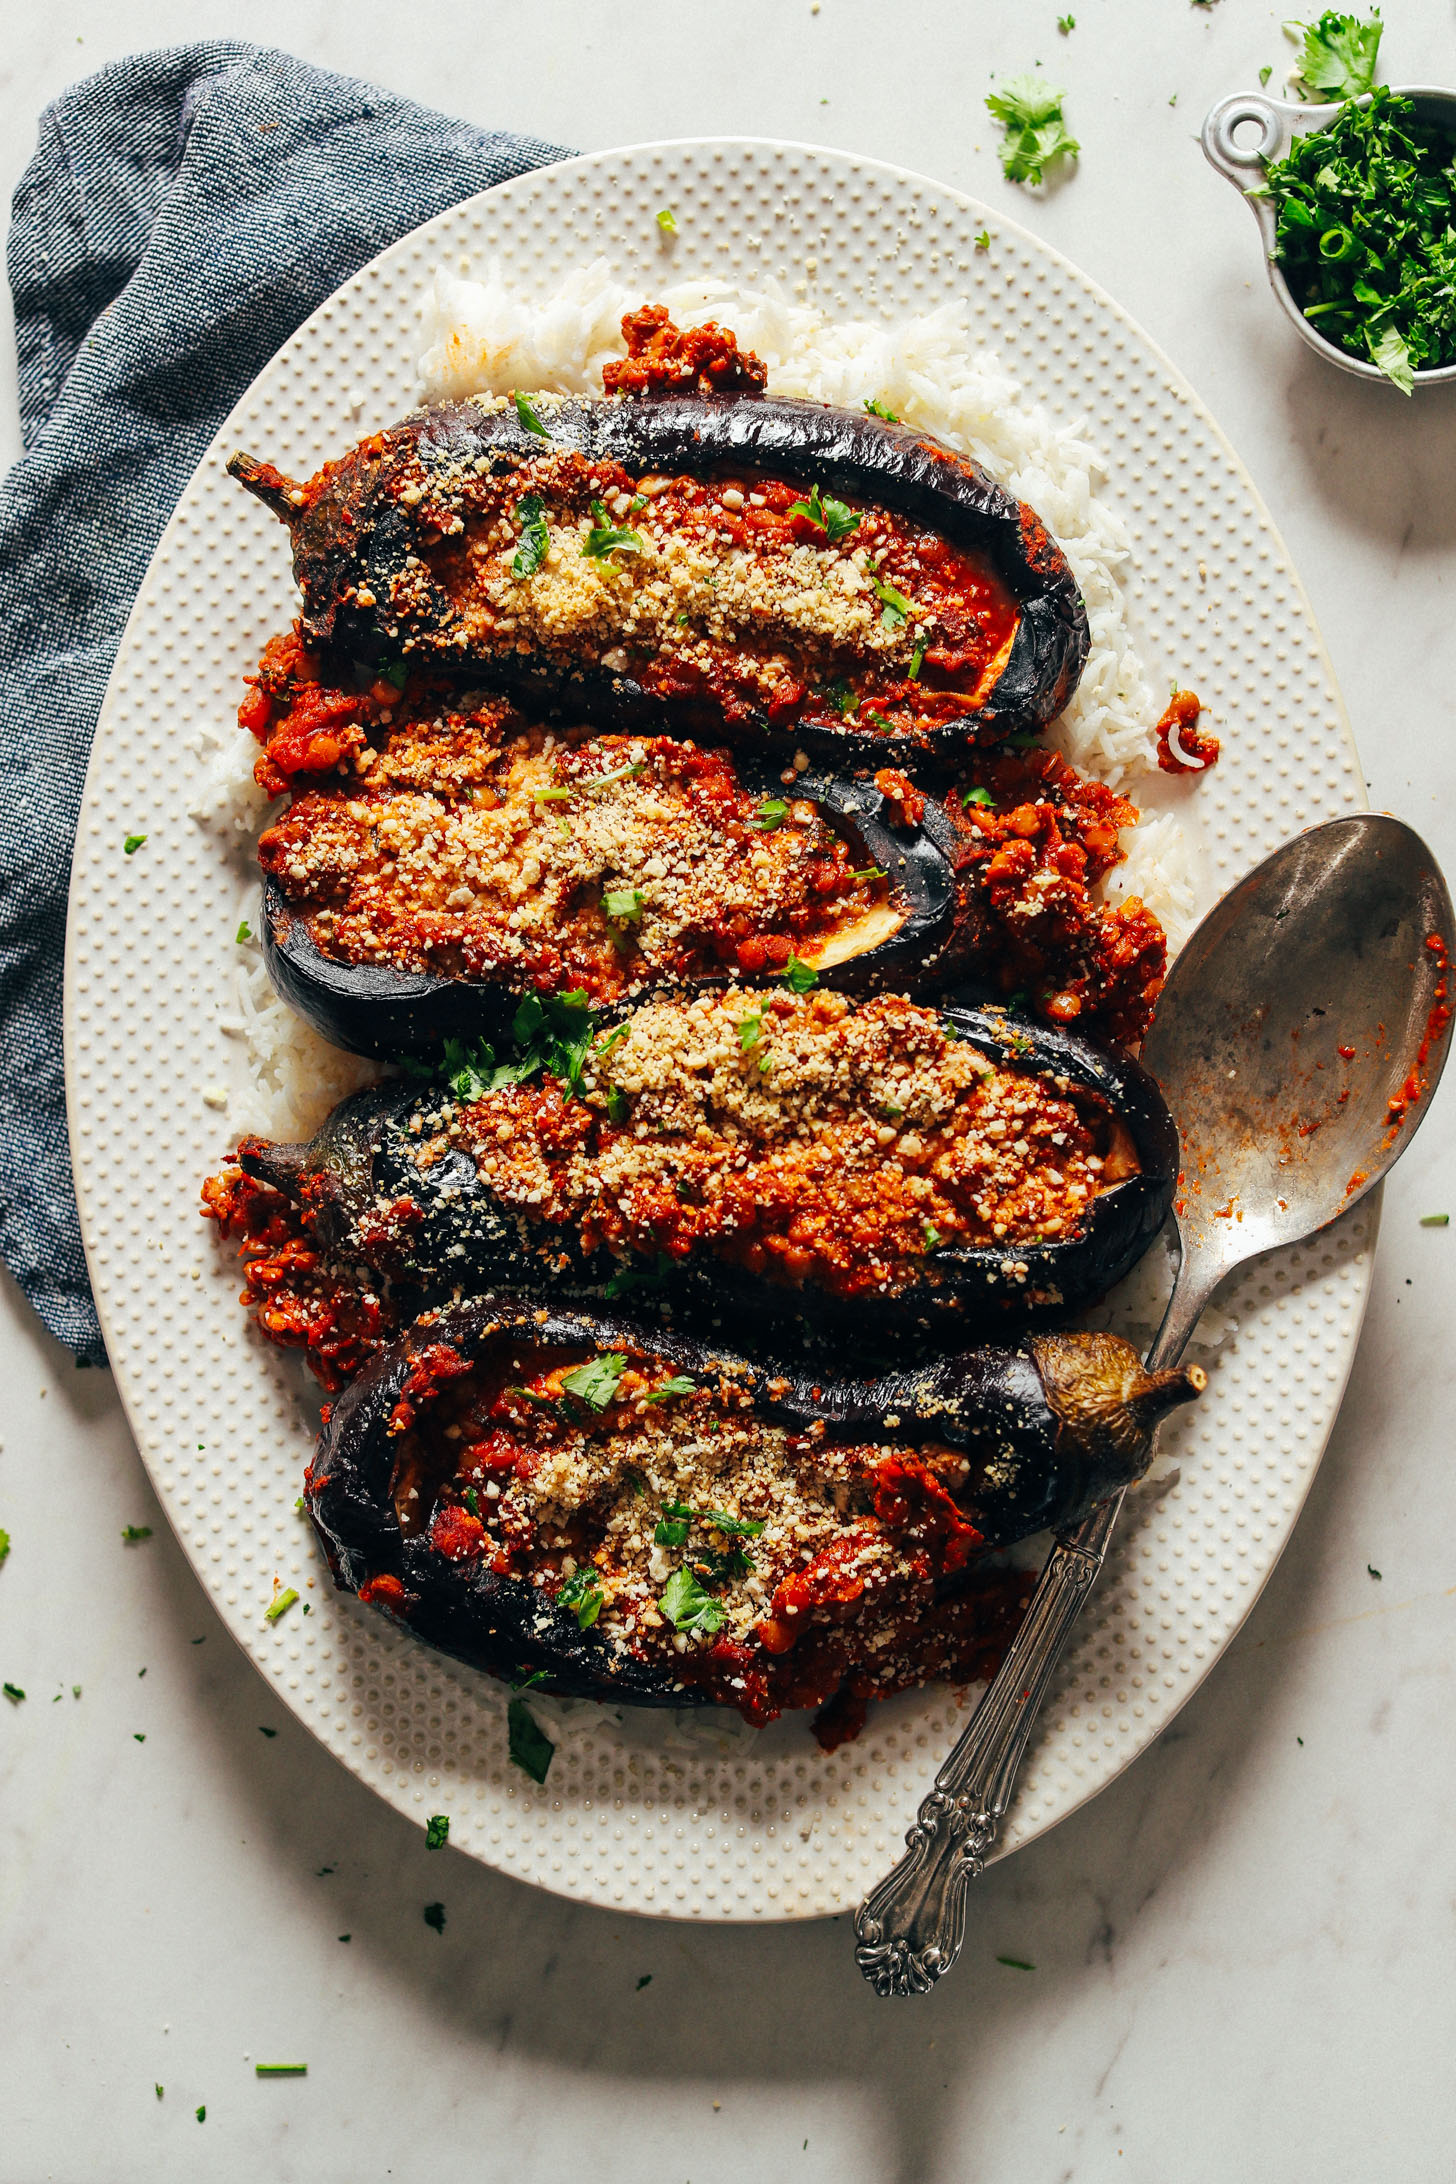 INCREDIBLE-Moroccan-Lentil-Stuffed-Eggplant-9-ingredients-BIG-flavor-so-delicious-vegan-plantbased-eggplant-lentils-recipe-glutenfree-minimalistbaker-22.jpg